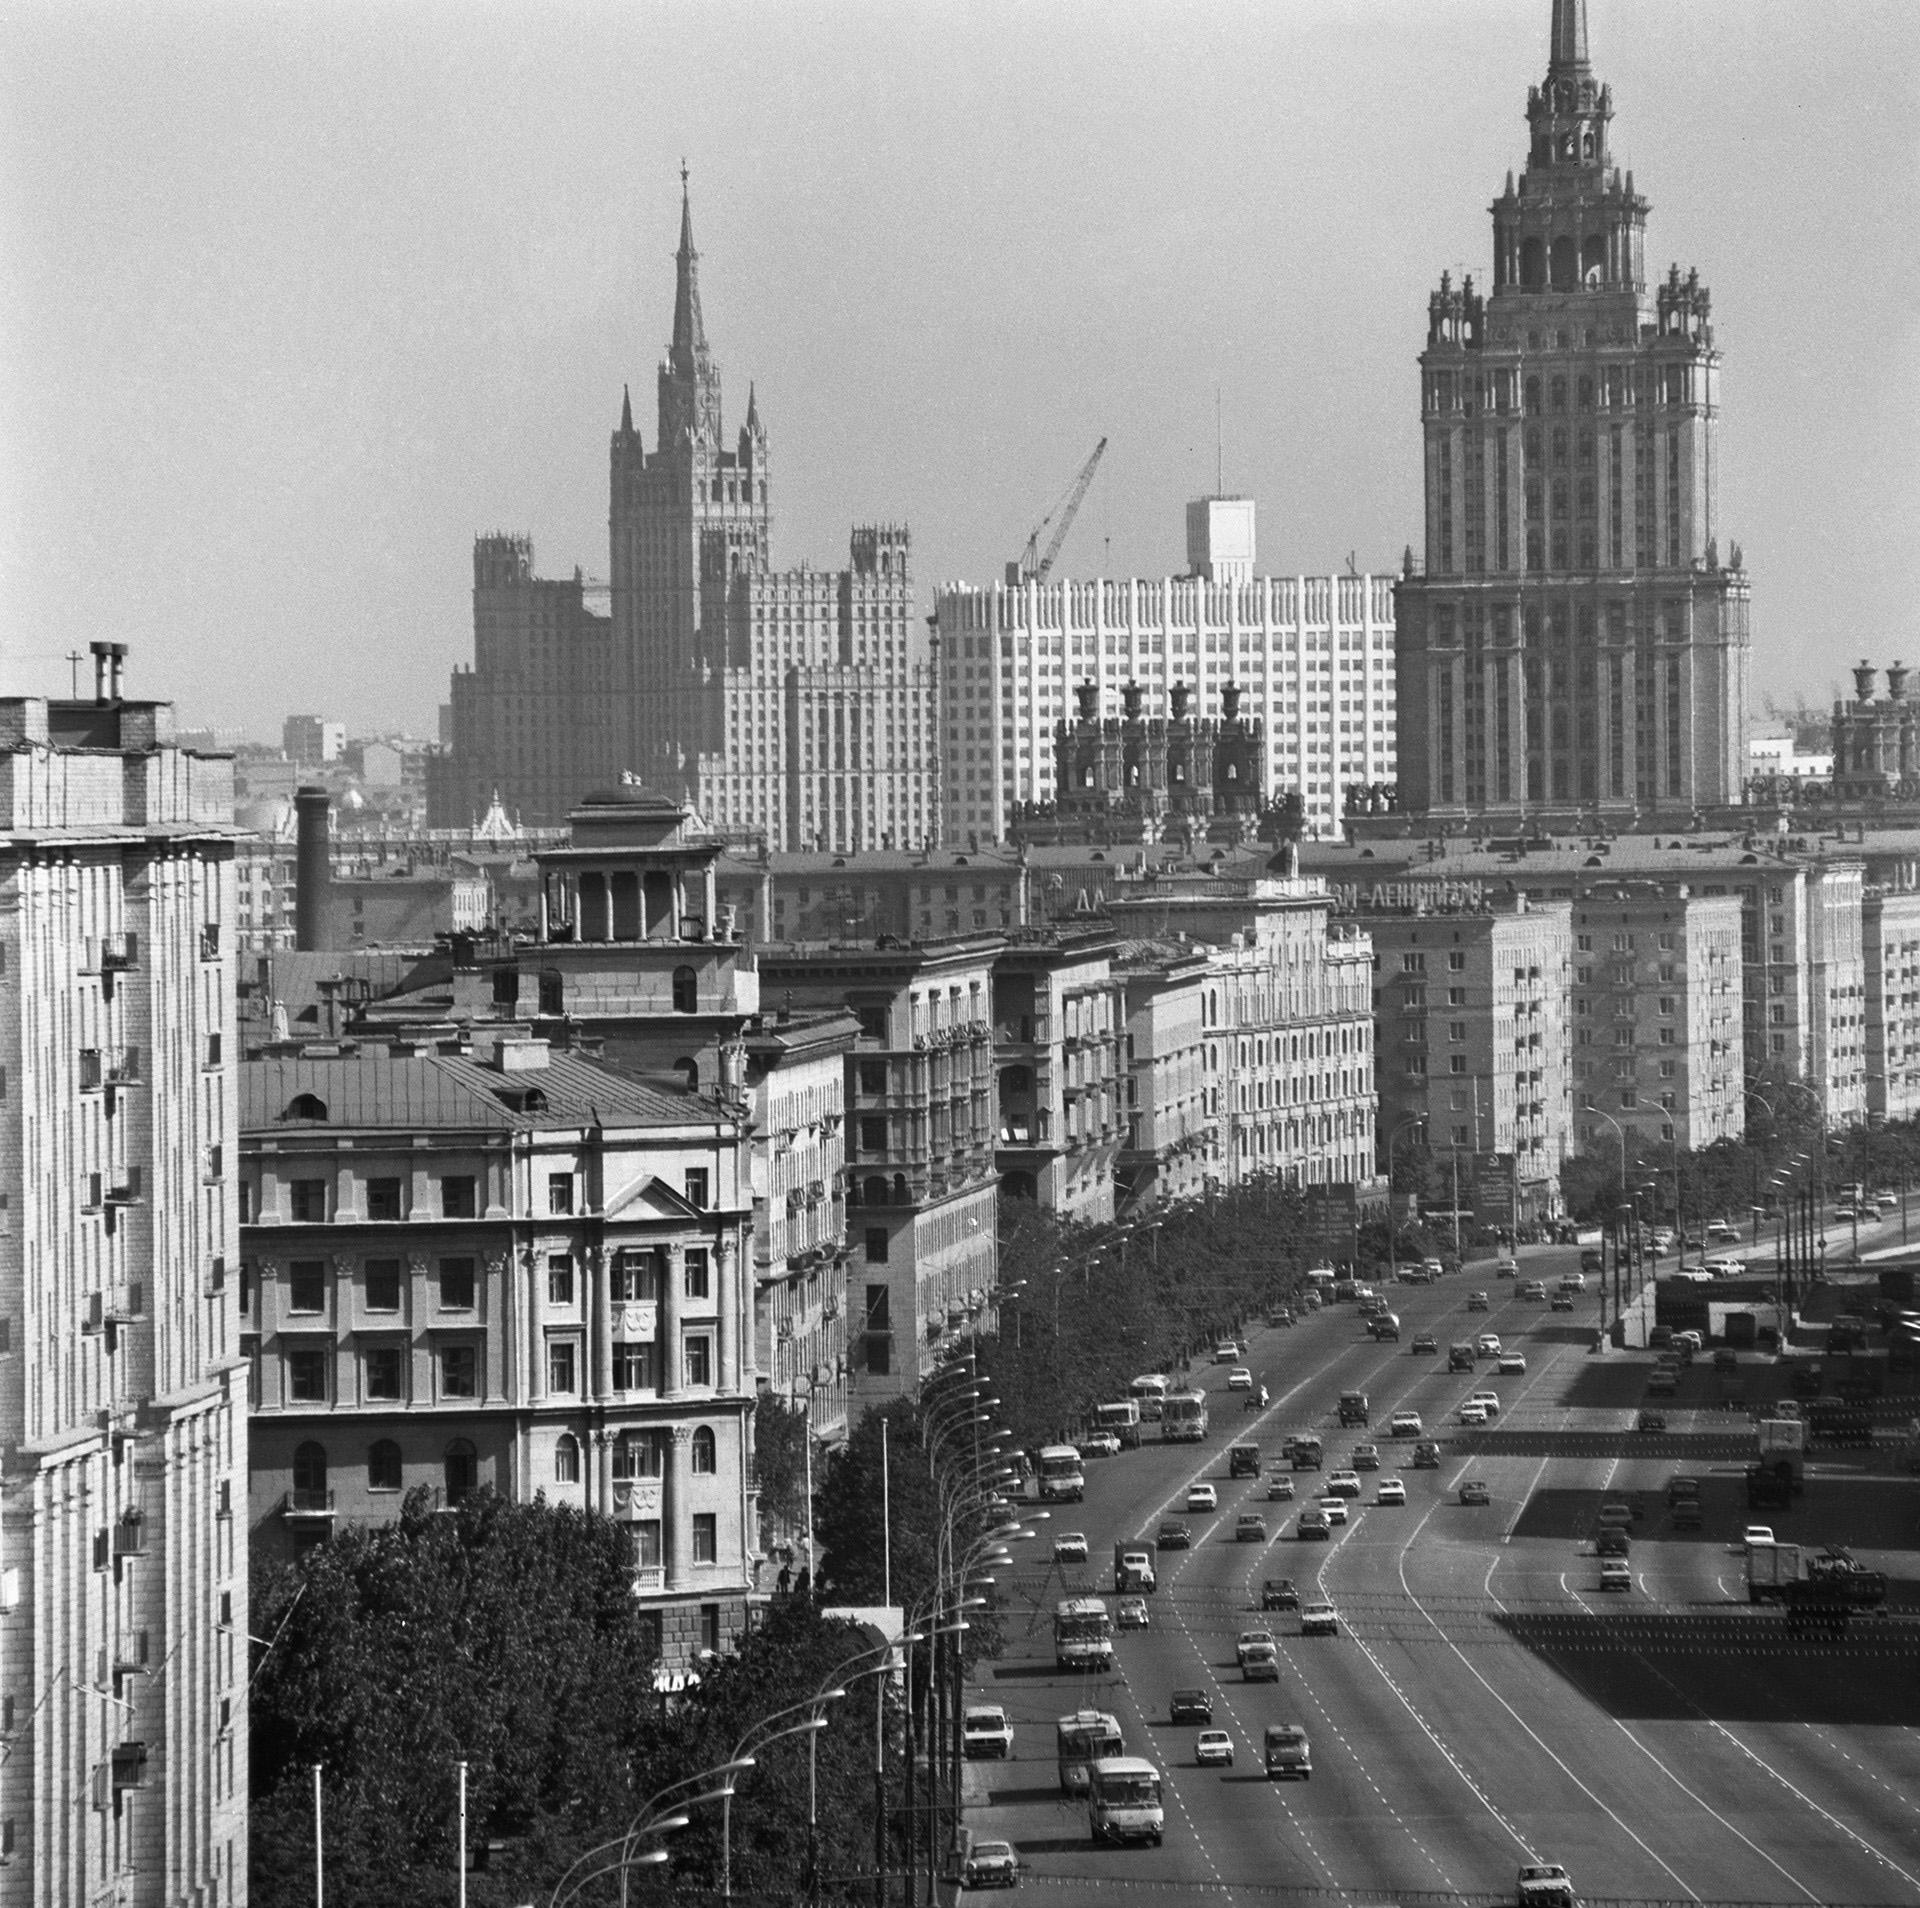 776483 Кутузовский проспект Виктор Кошевой кон.70-х